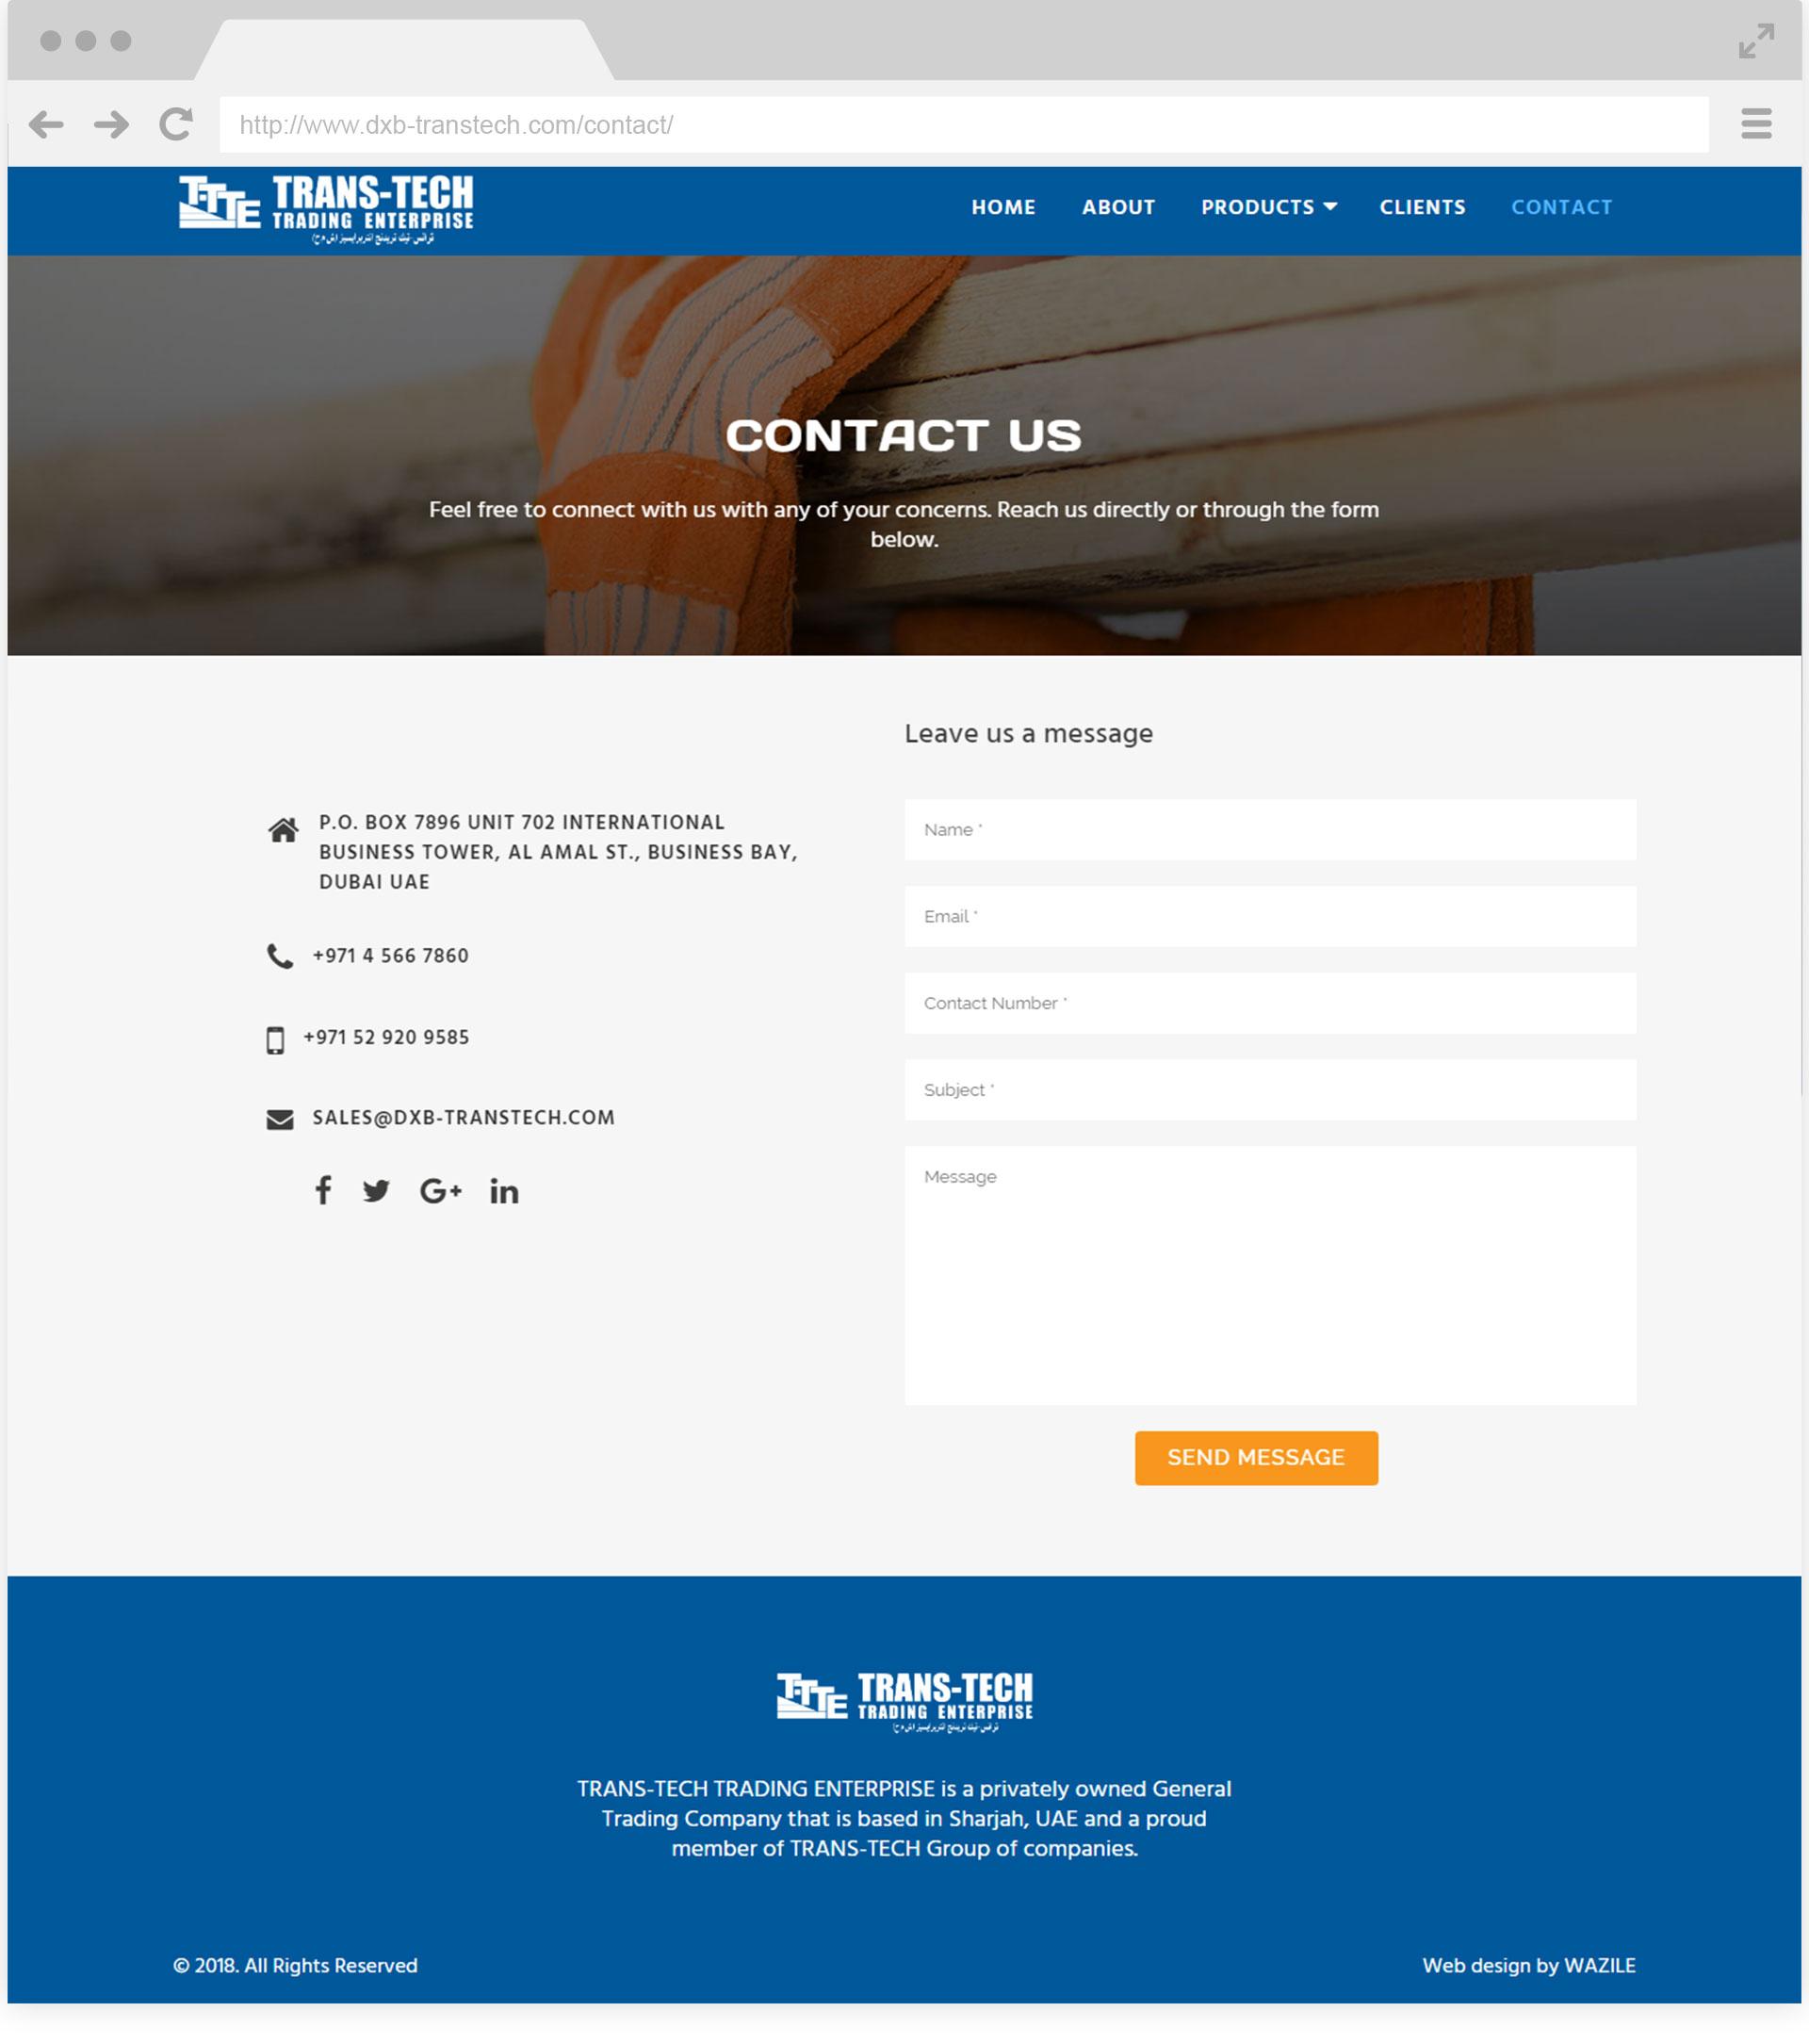 DXB Transtech Contact